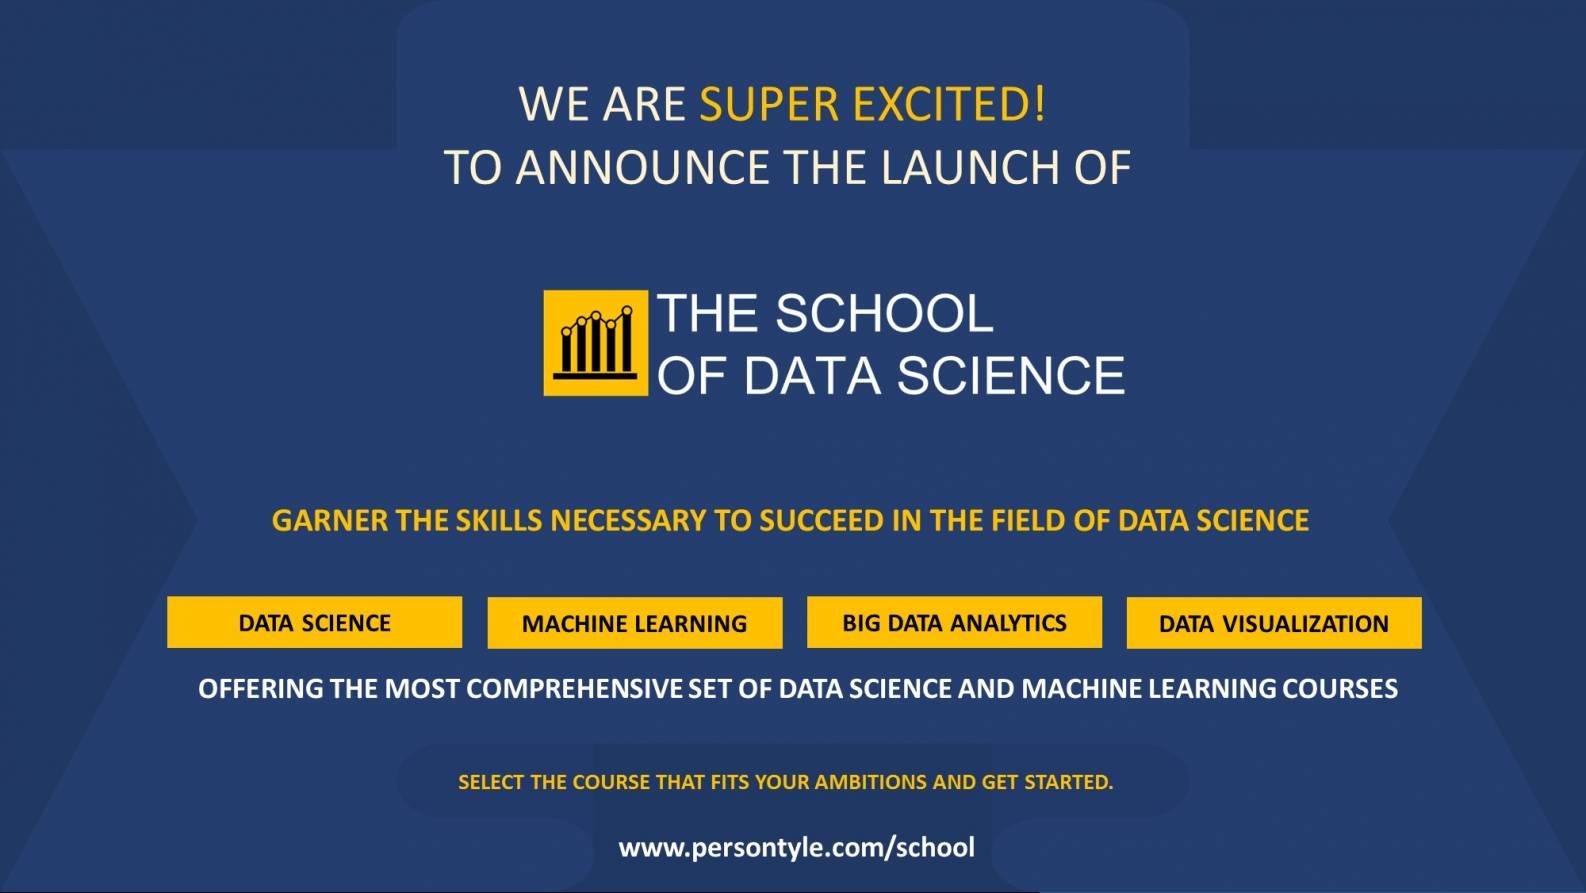 School of Data Science Launch